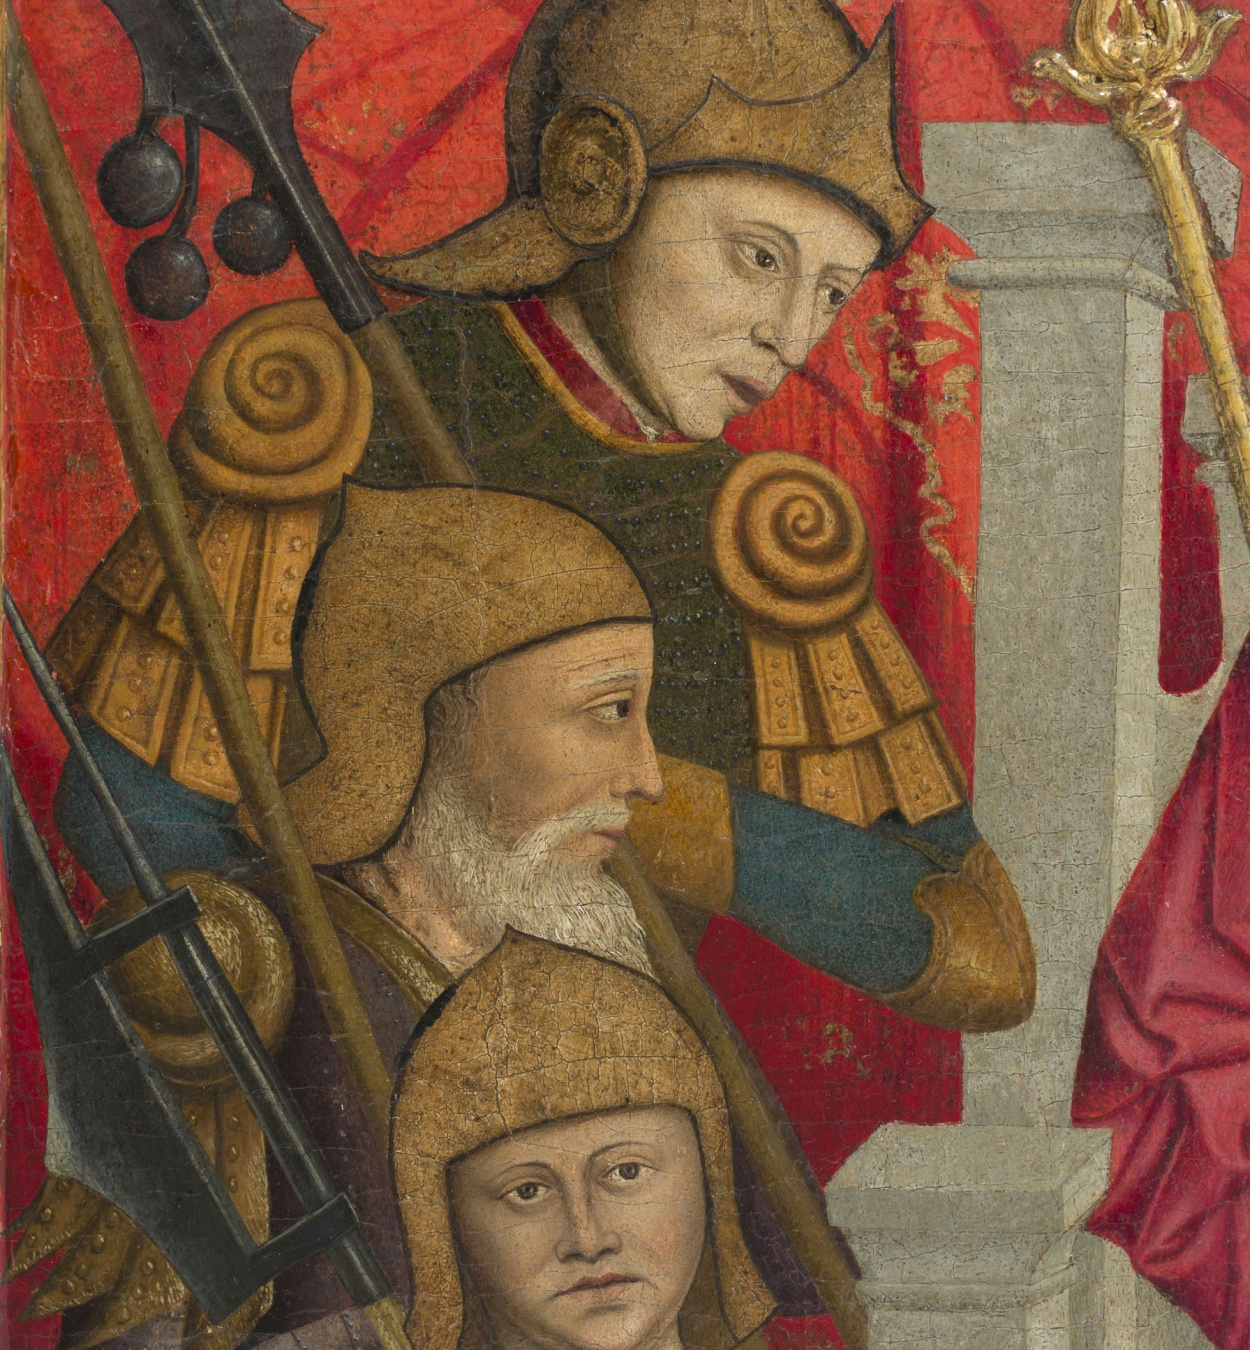 Lluís Dalmau - The Beheading of Saint Baudilus - circa 1448 [4]